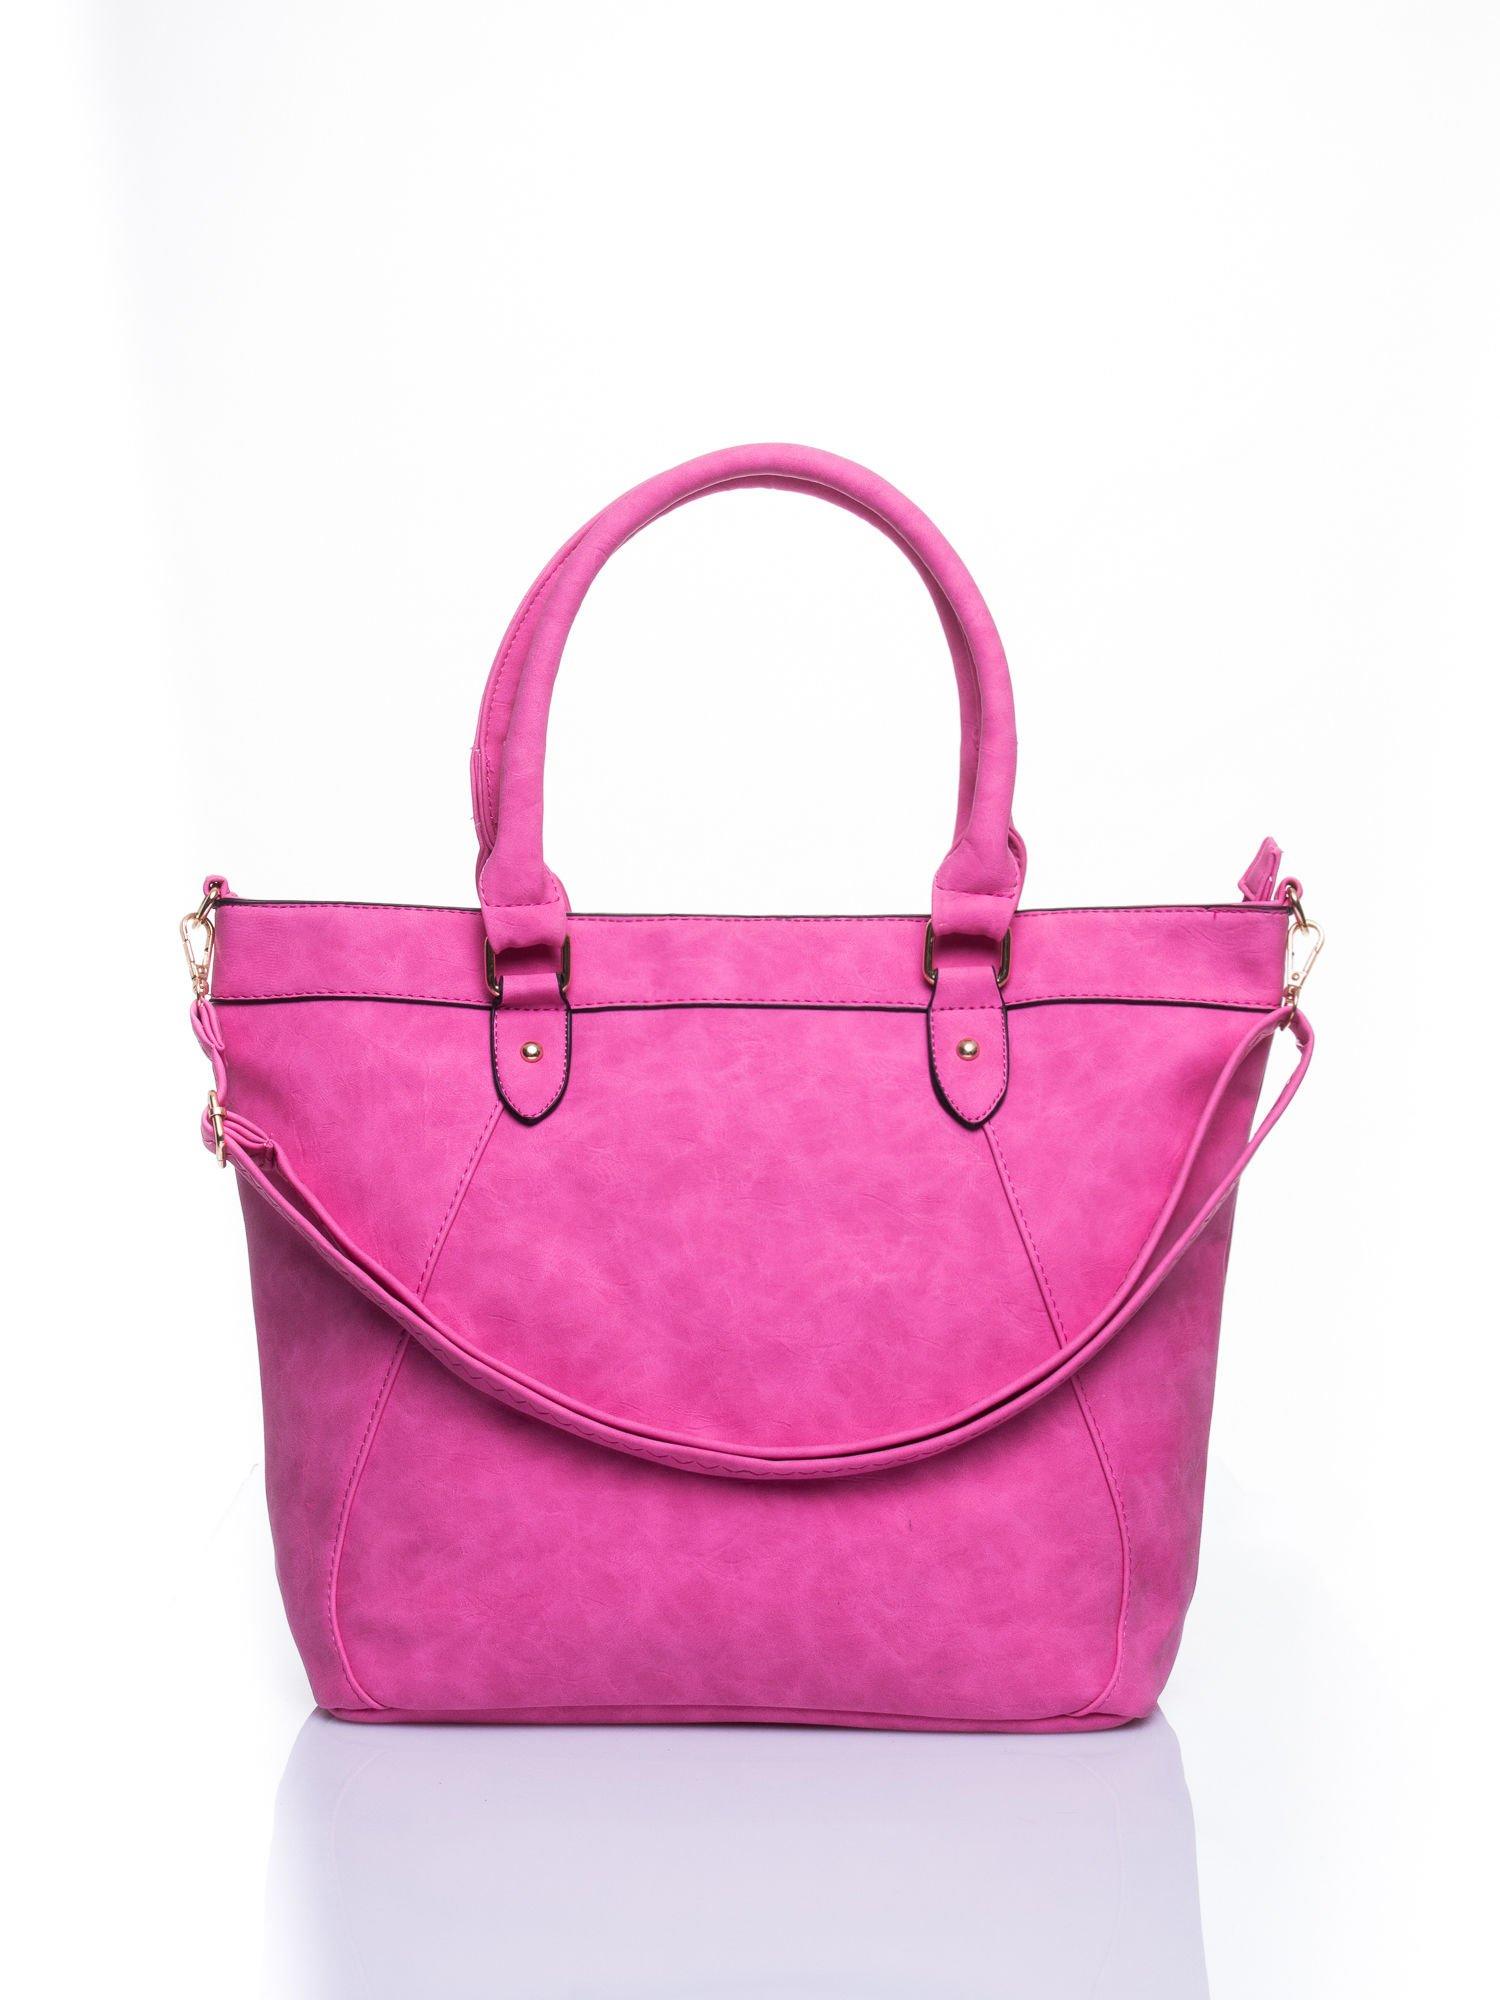 Jasnoróżoa torba city bag na ramię                                  zdj.                                  1